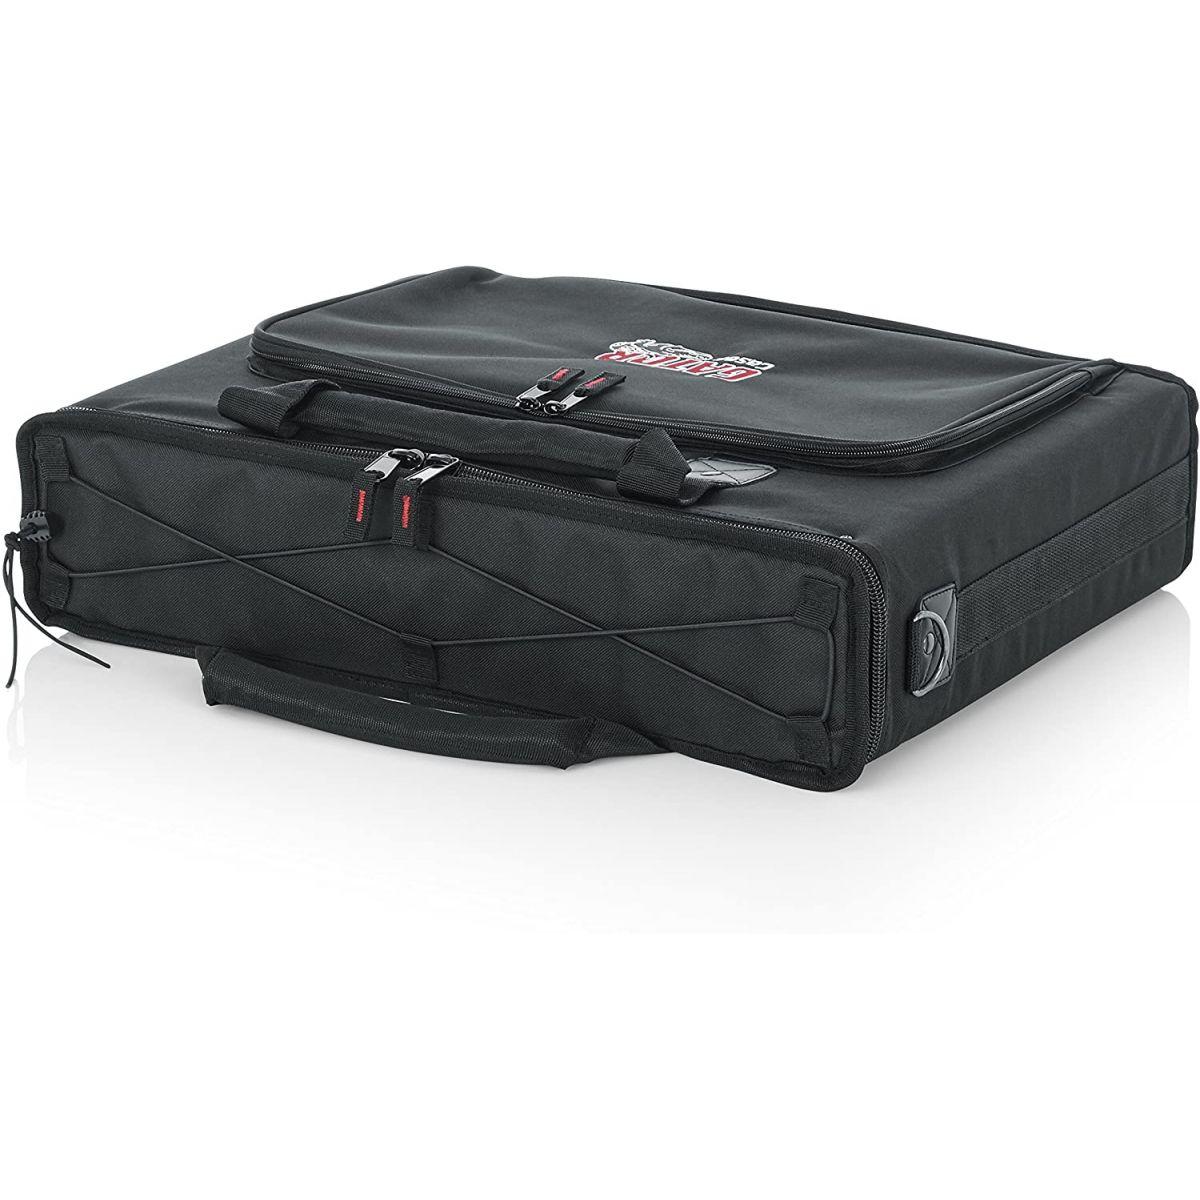 Flight cases rackables ABS - Gator - GRB-2U